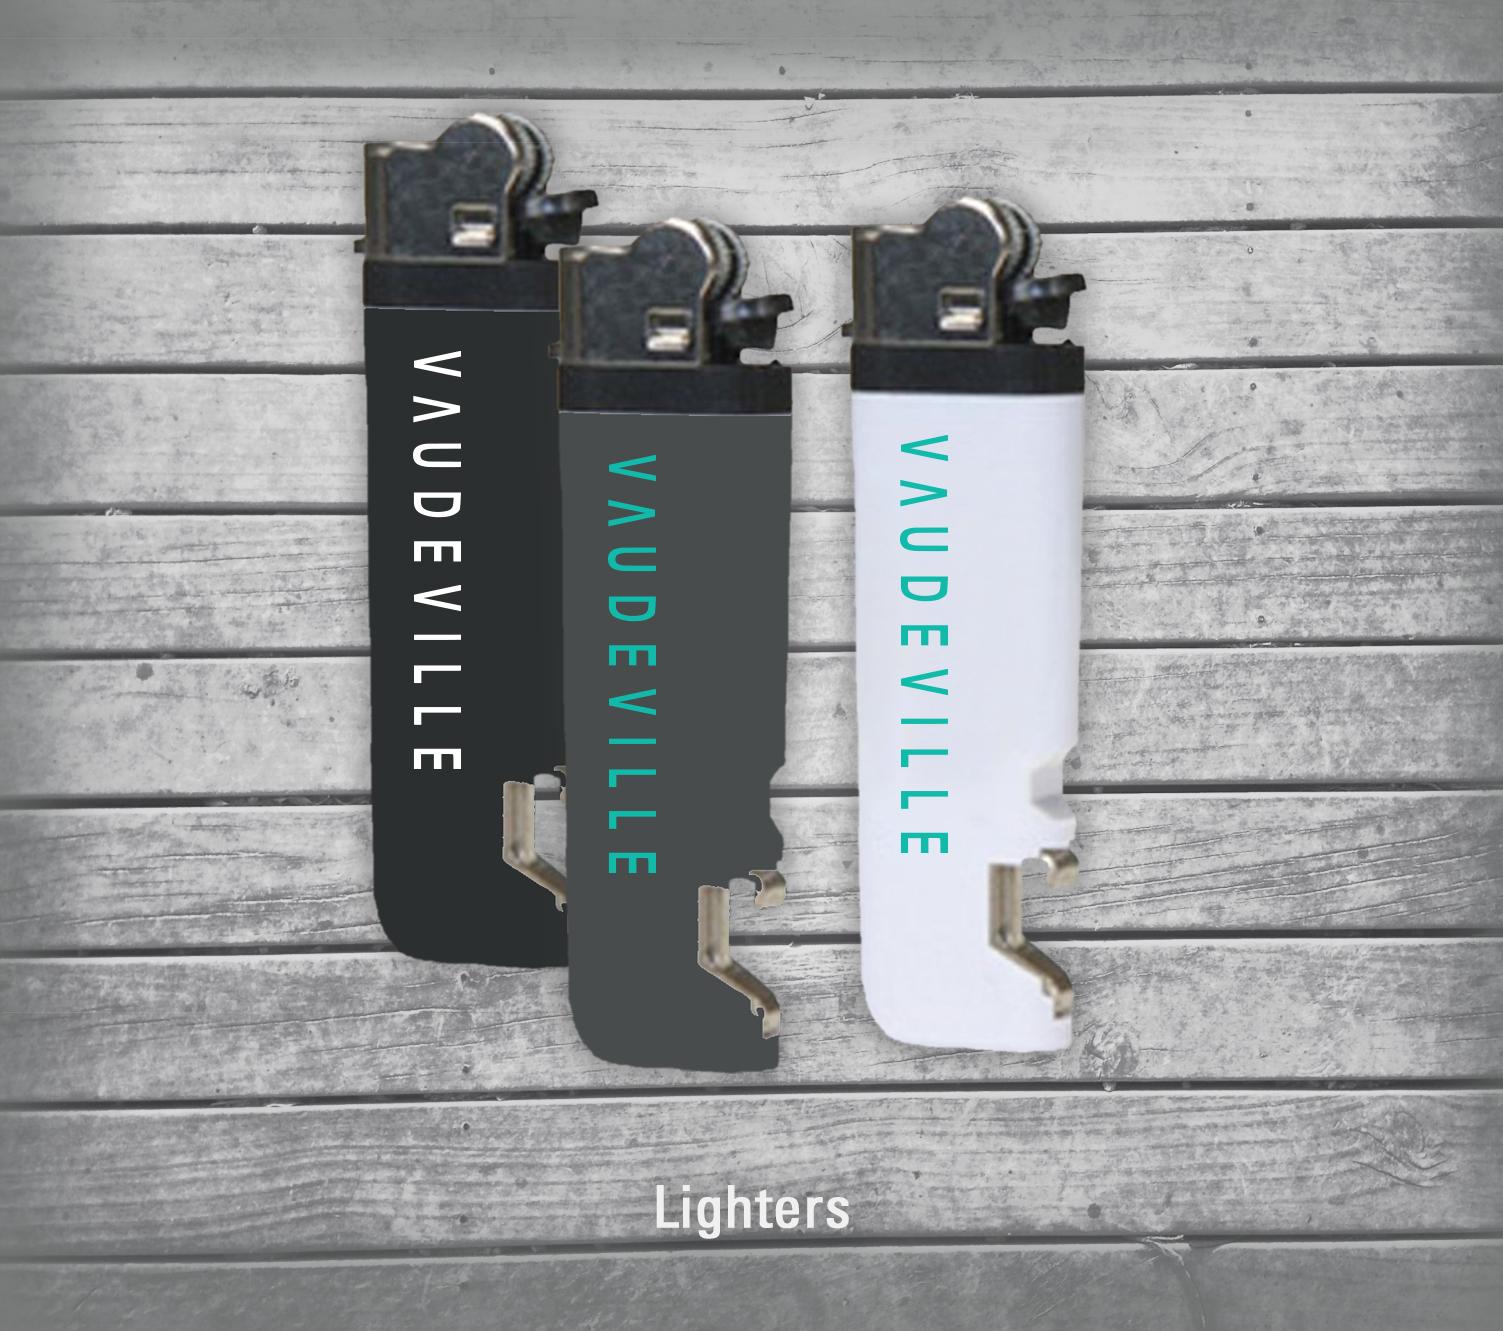 Lighters_Vaudeville.jpg